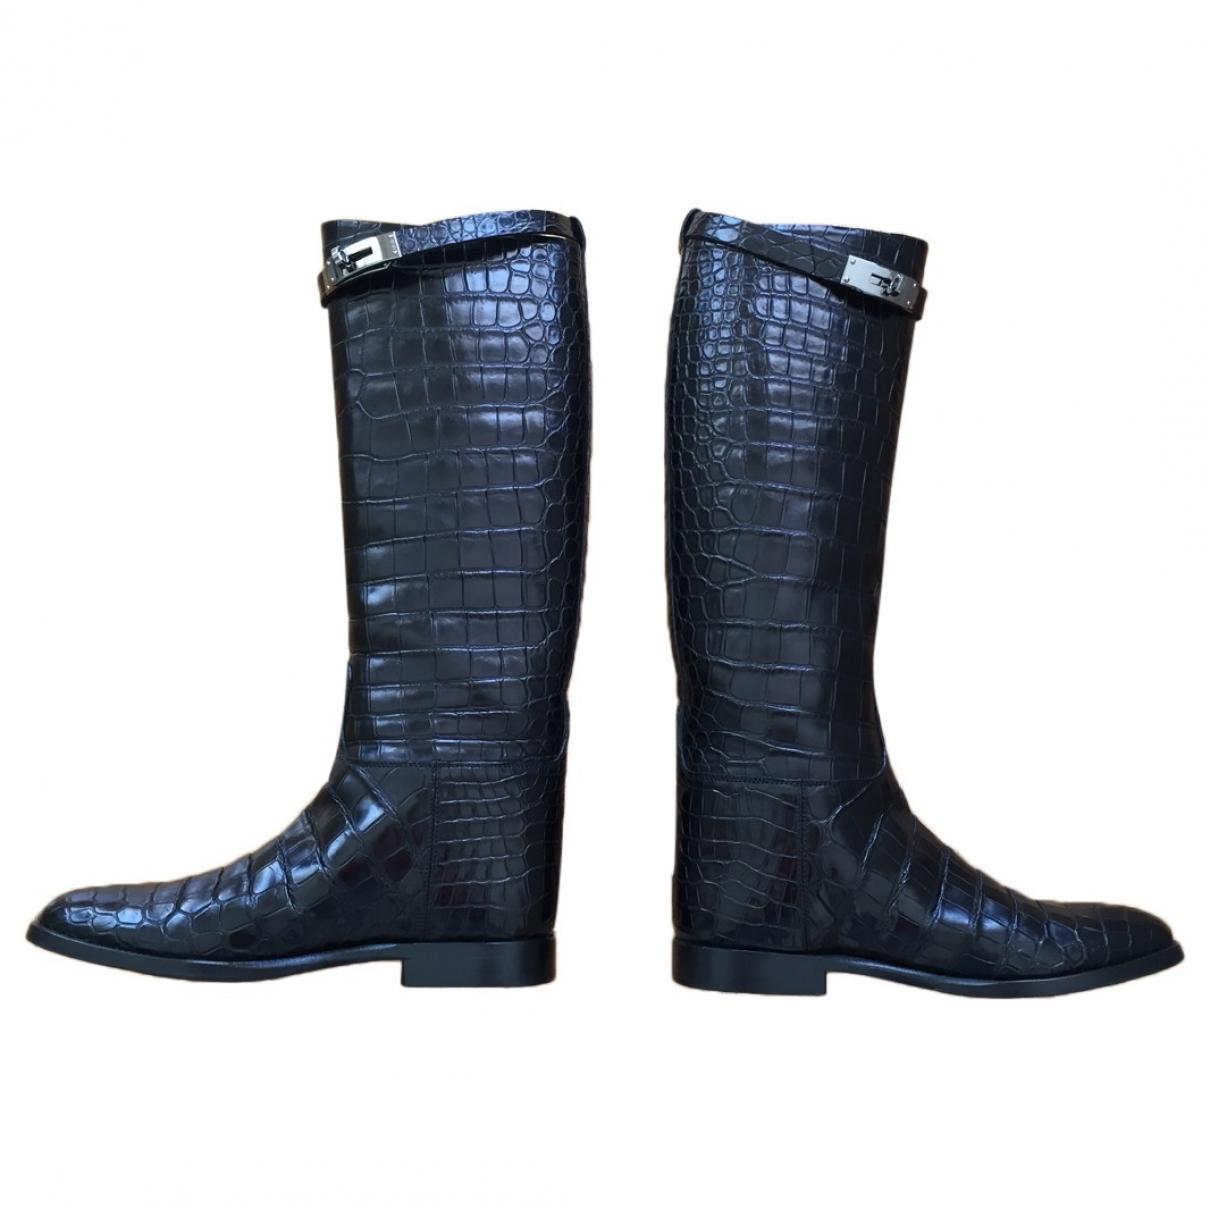 Hermès Jumping Black Alligator Boots for Women 38 EU